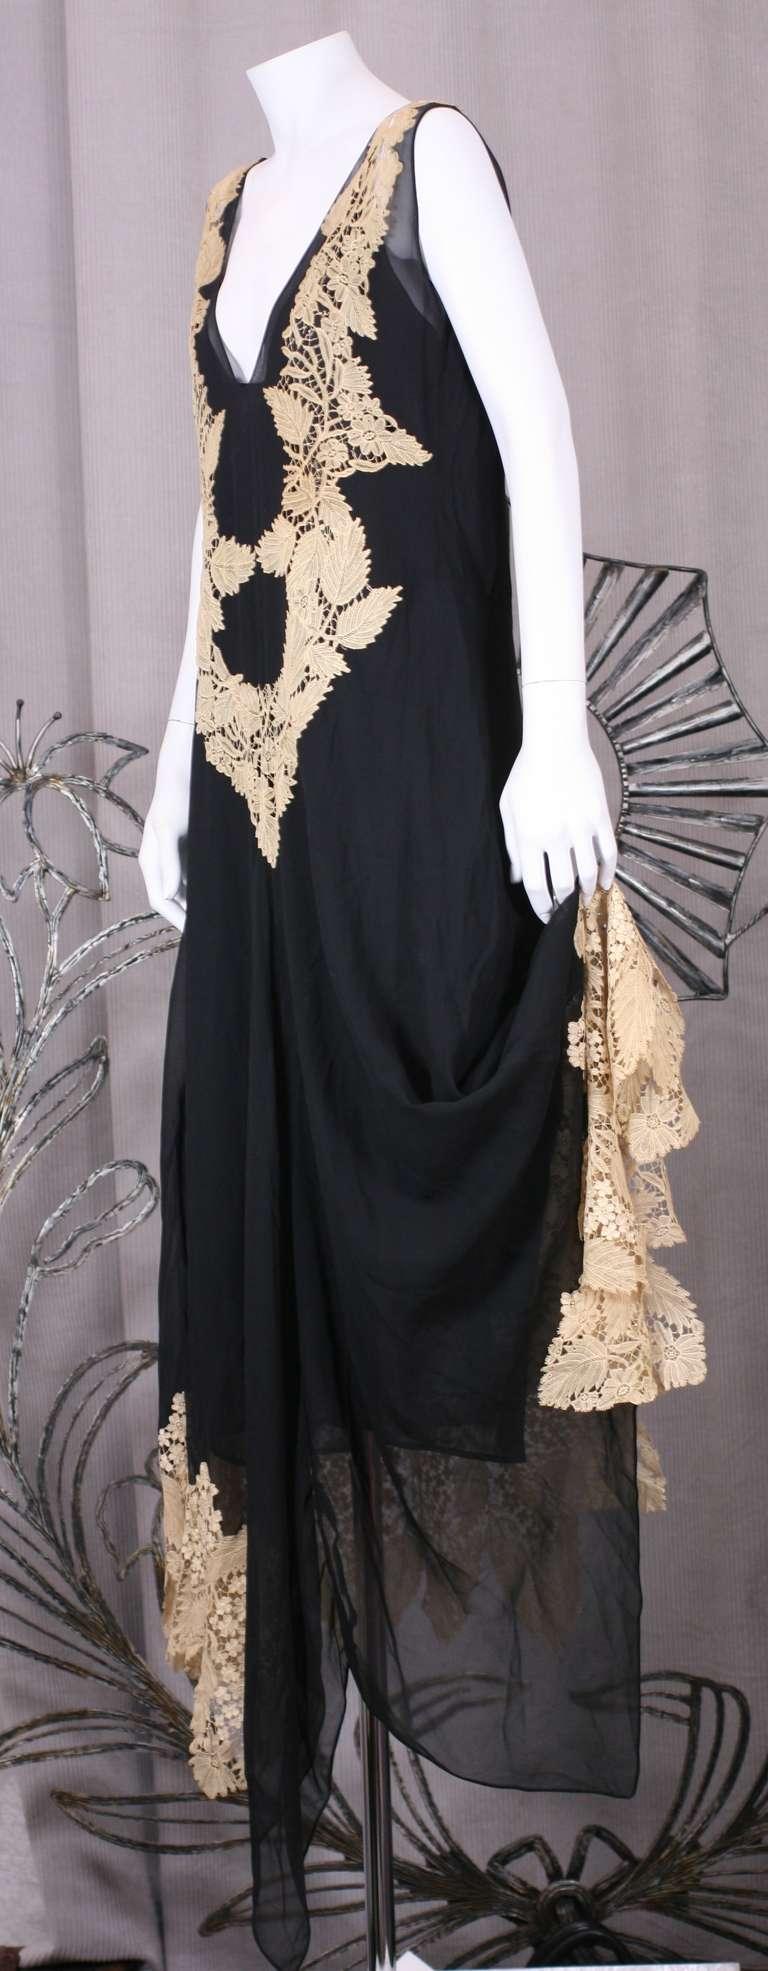 Amazing Art Deco Chiffon Gown with Hydrangea Lace 3